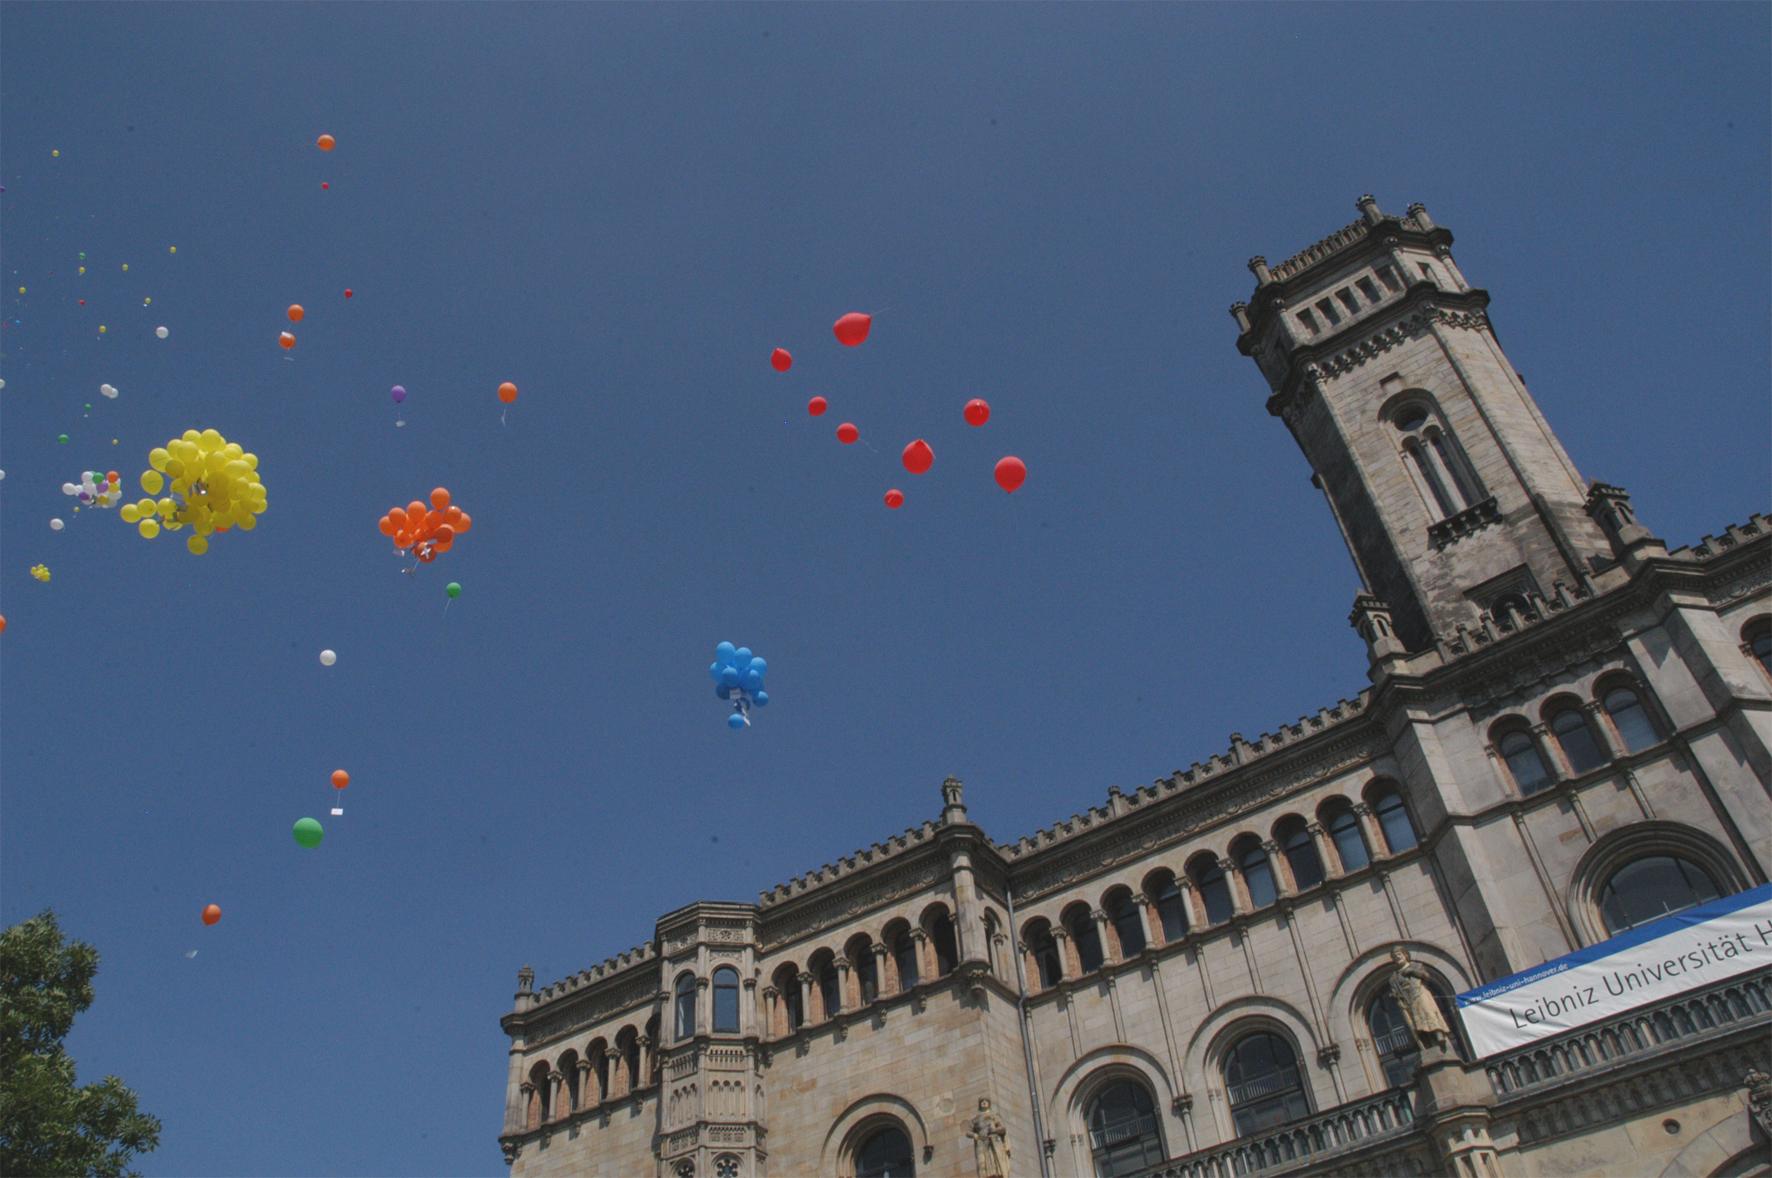 Foto luftballons vor leibniz universität hannover